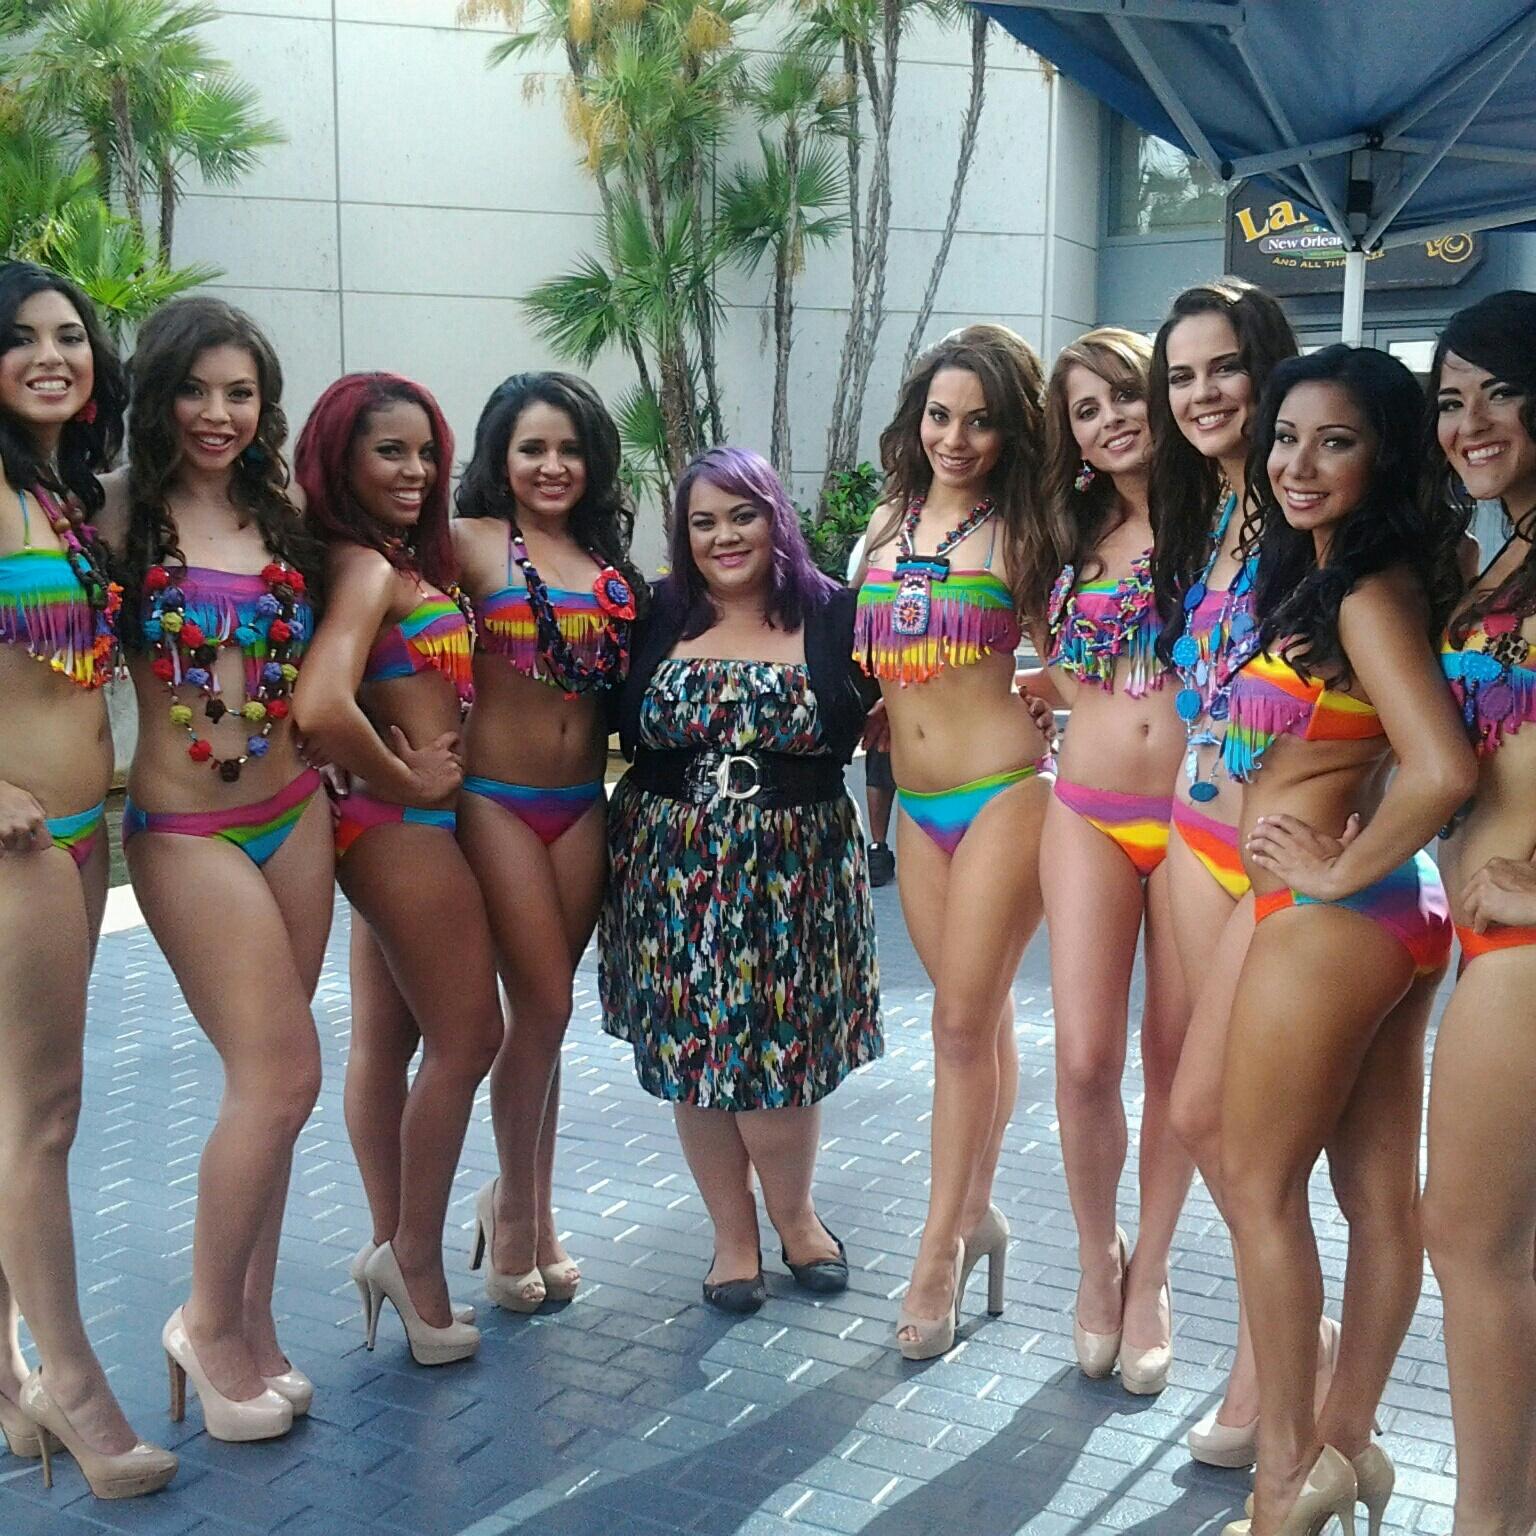 Latina bikini girls group apologise, but